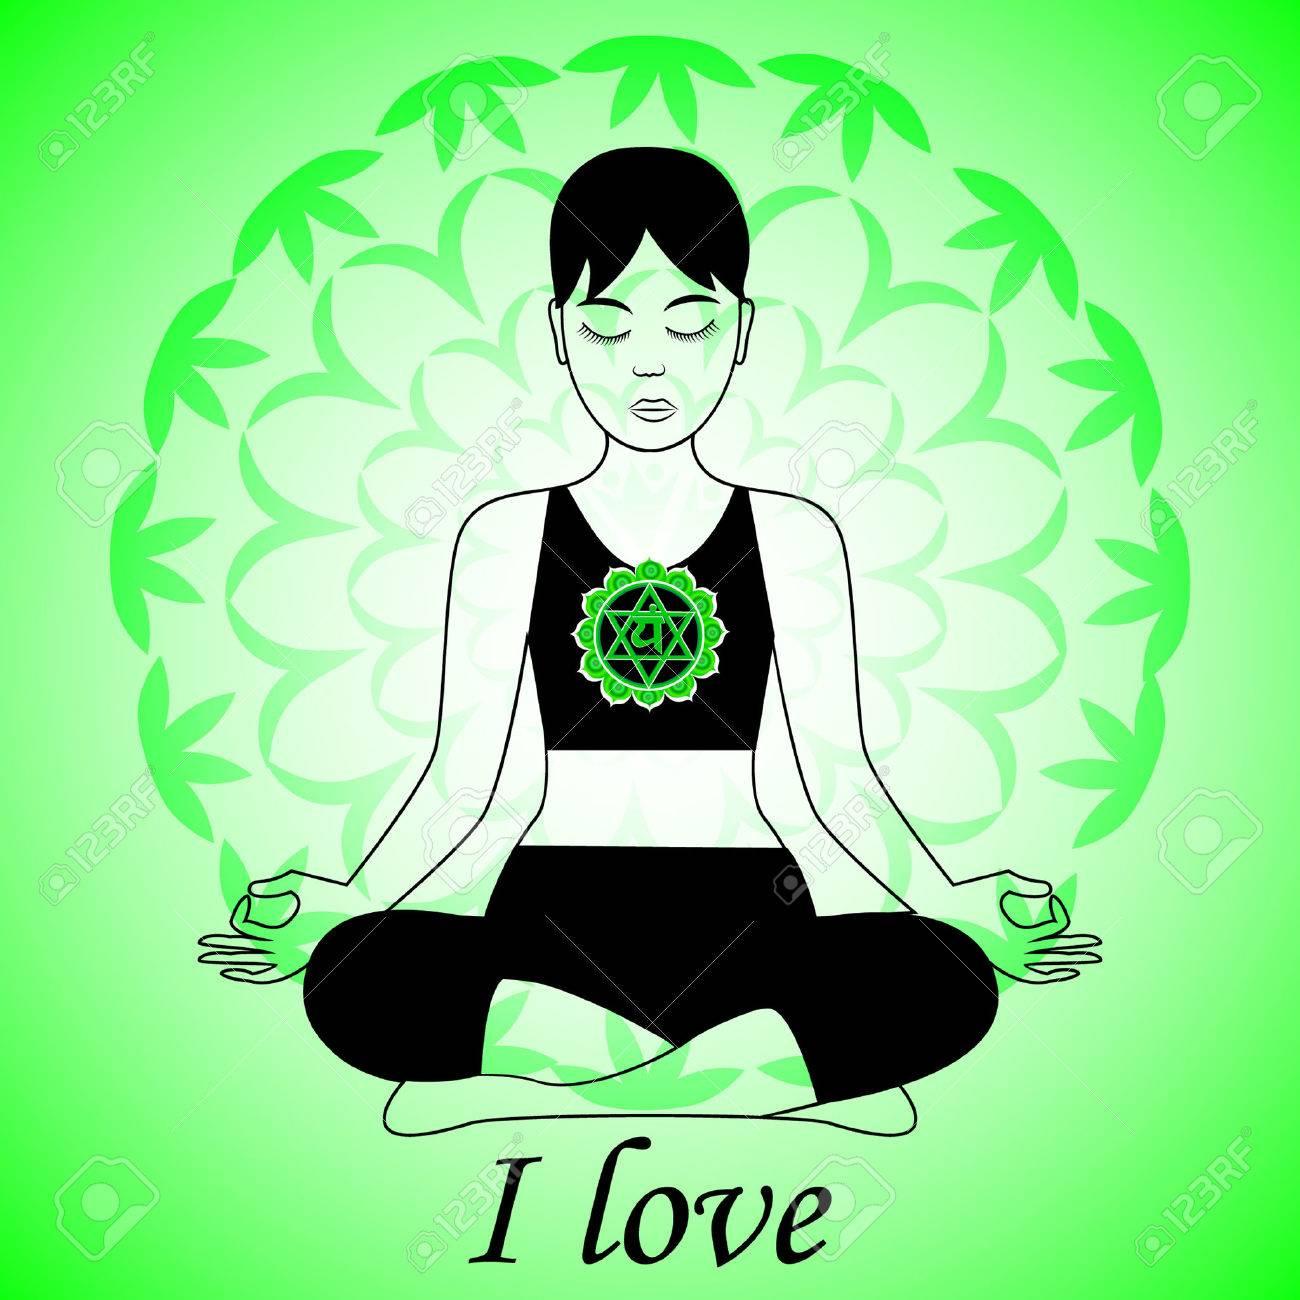 Meditating women. Anahata chakra activation. I love. - 55910525